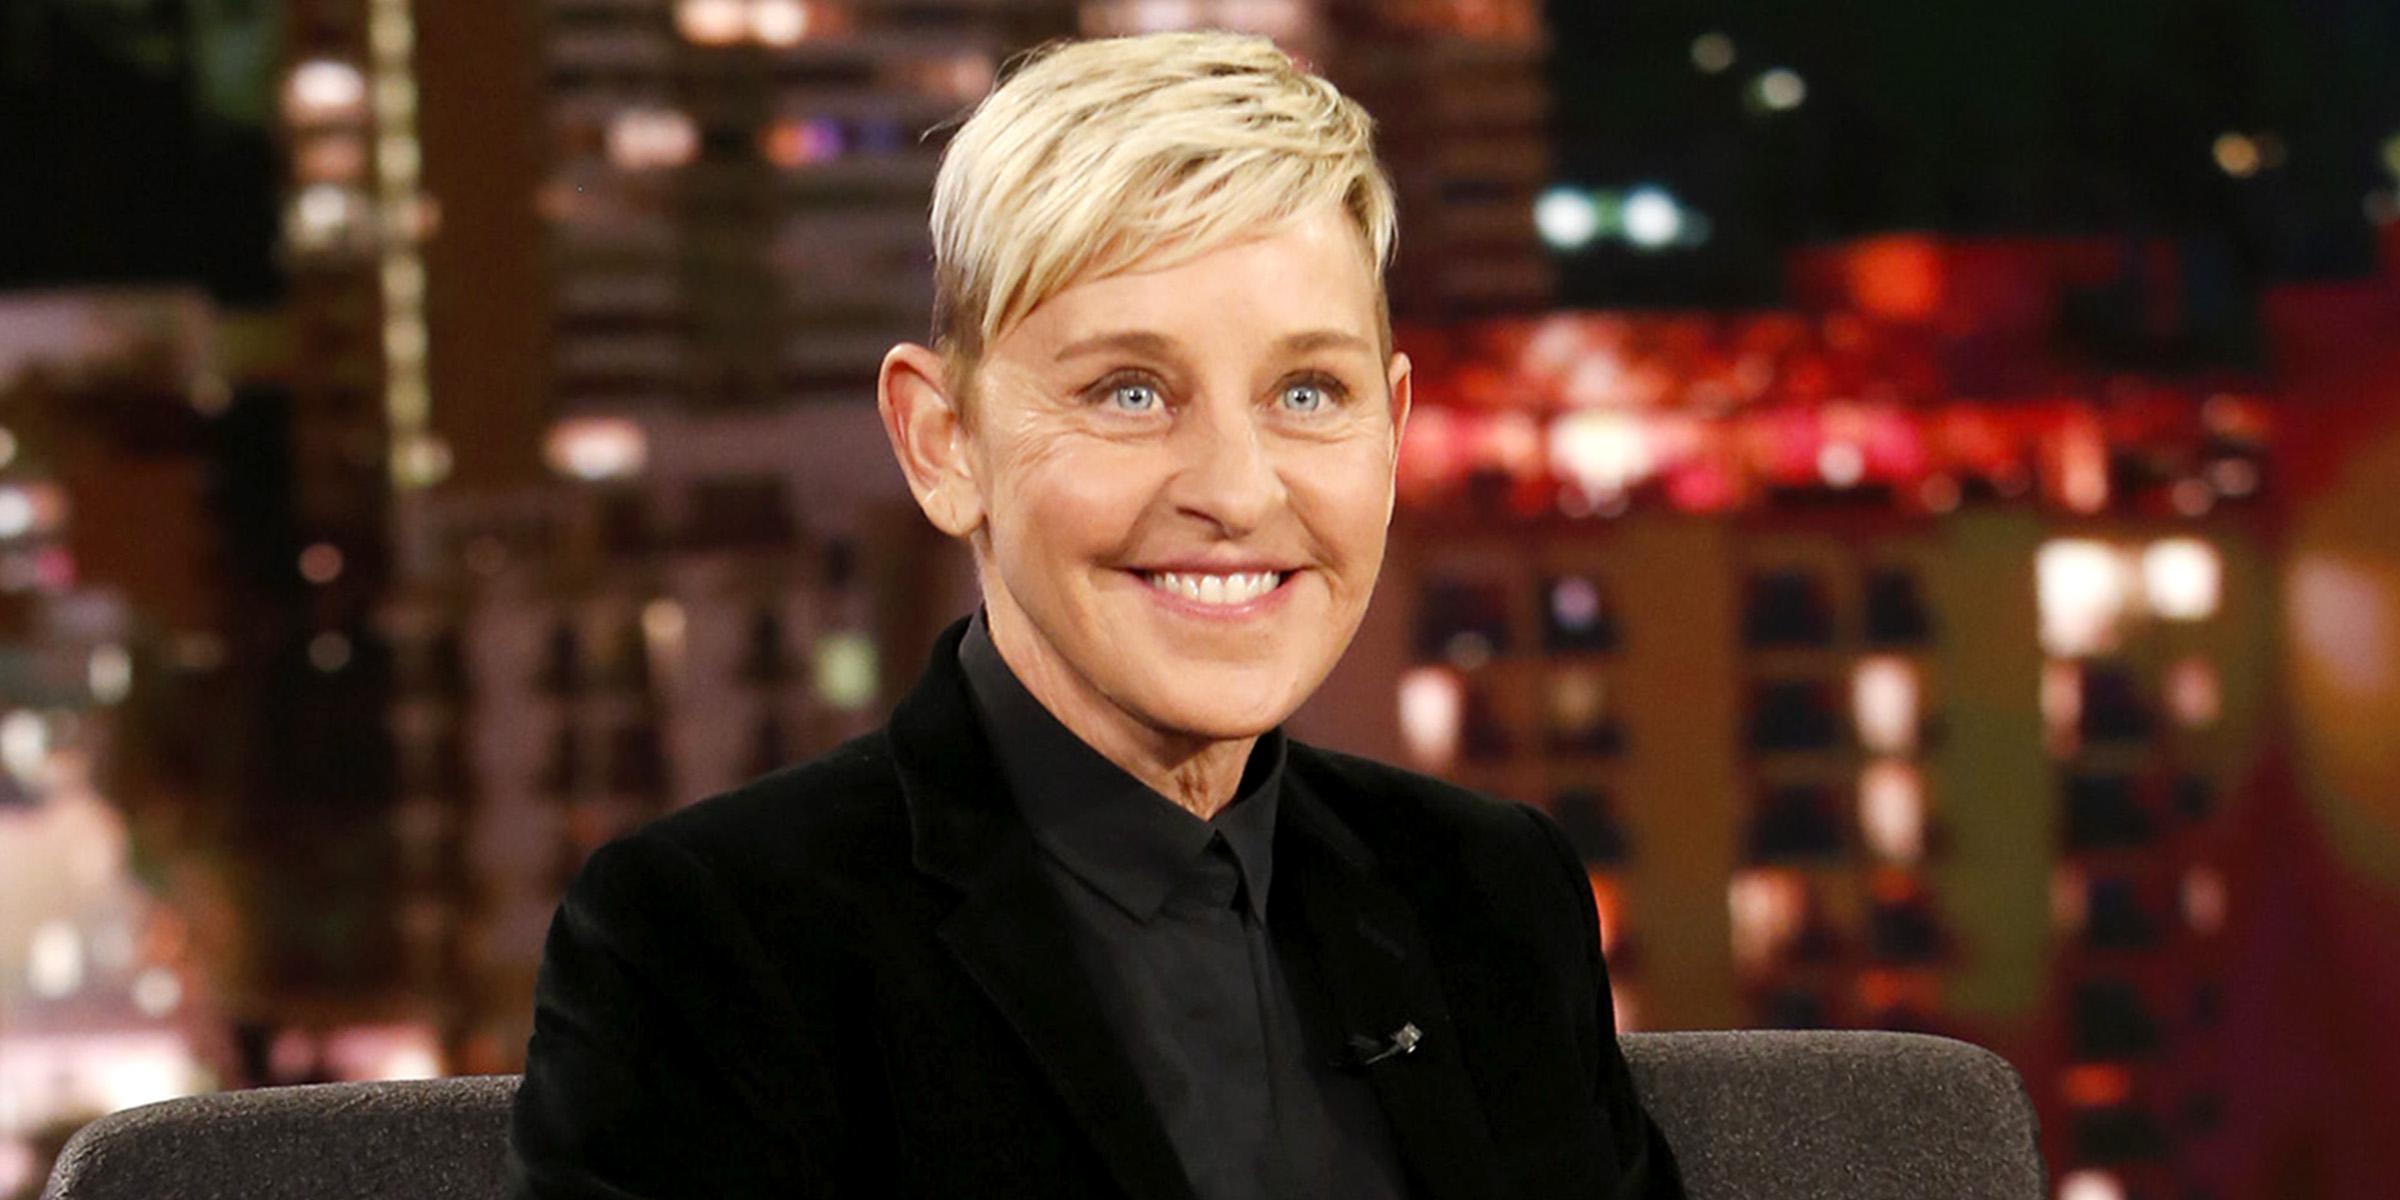 Ellen DeGeneres reveals natural hair color for the 1st time